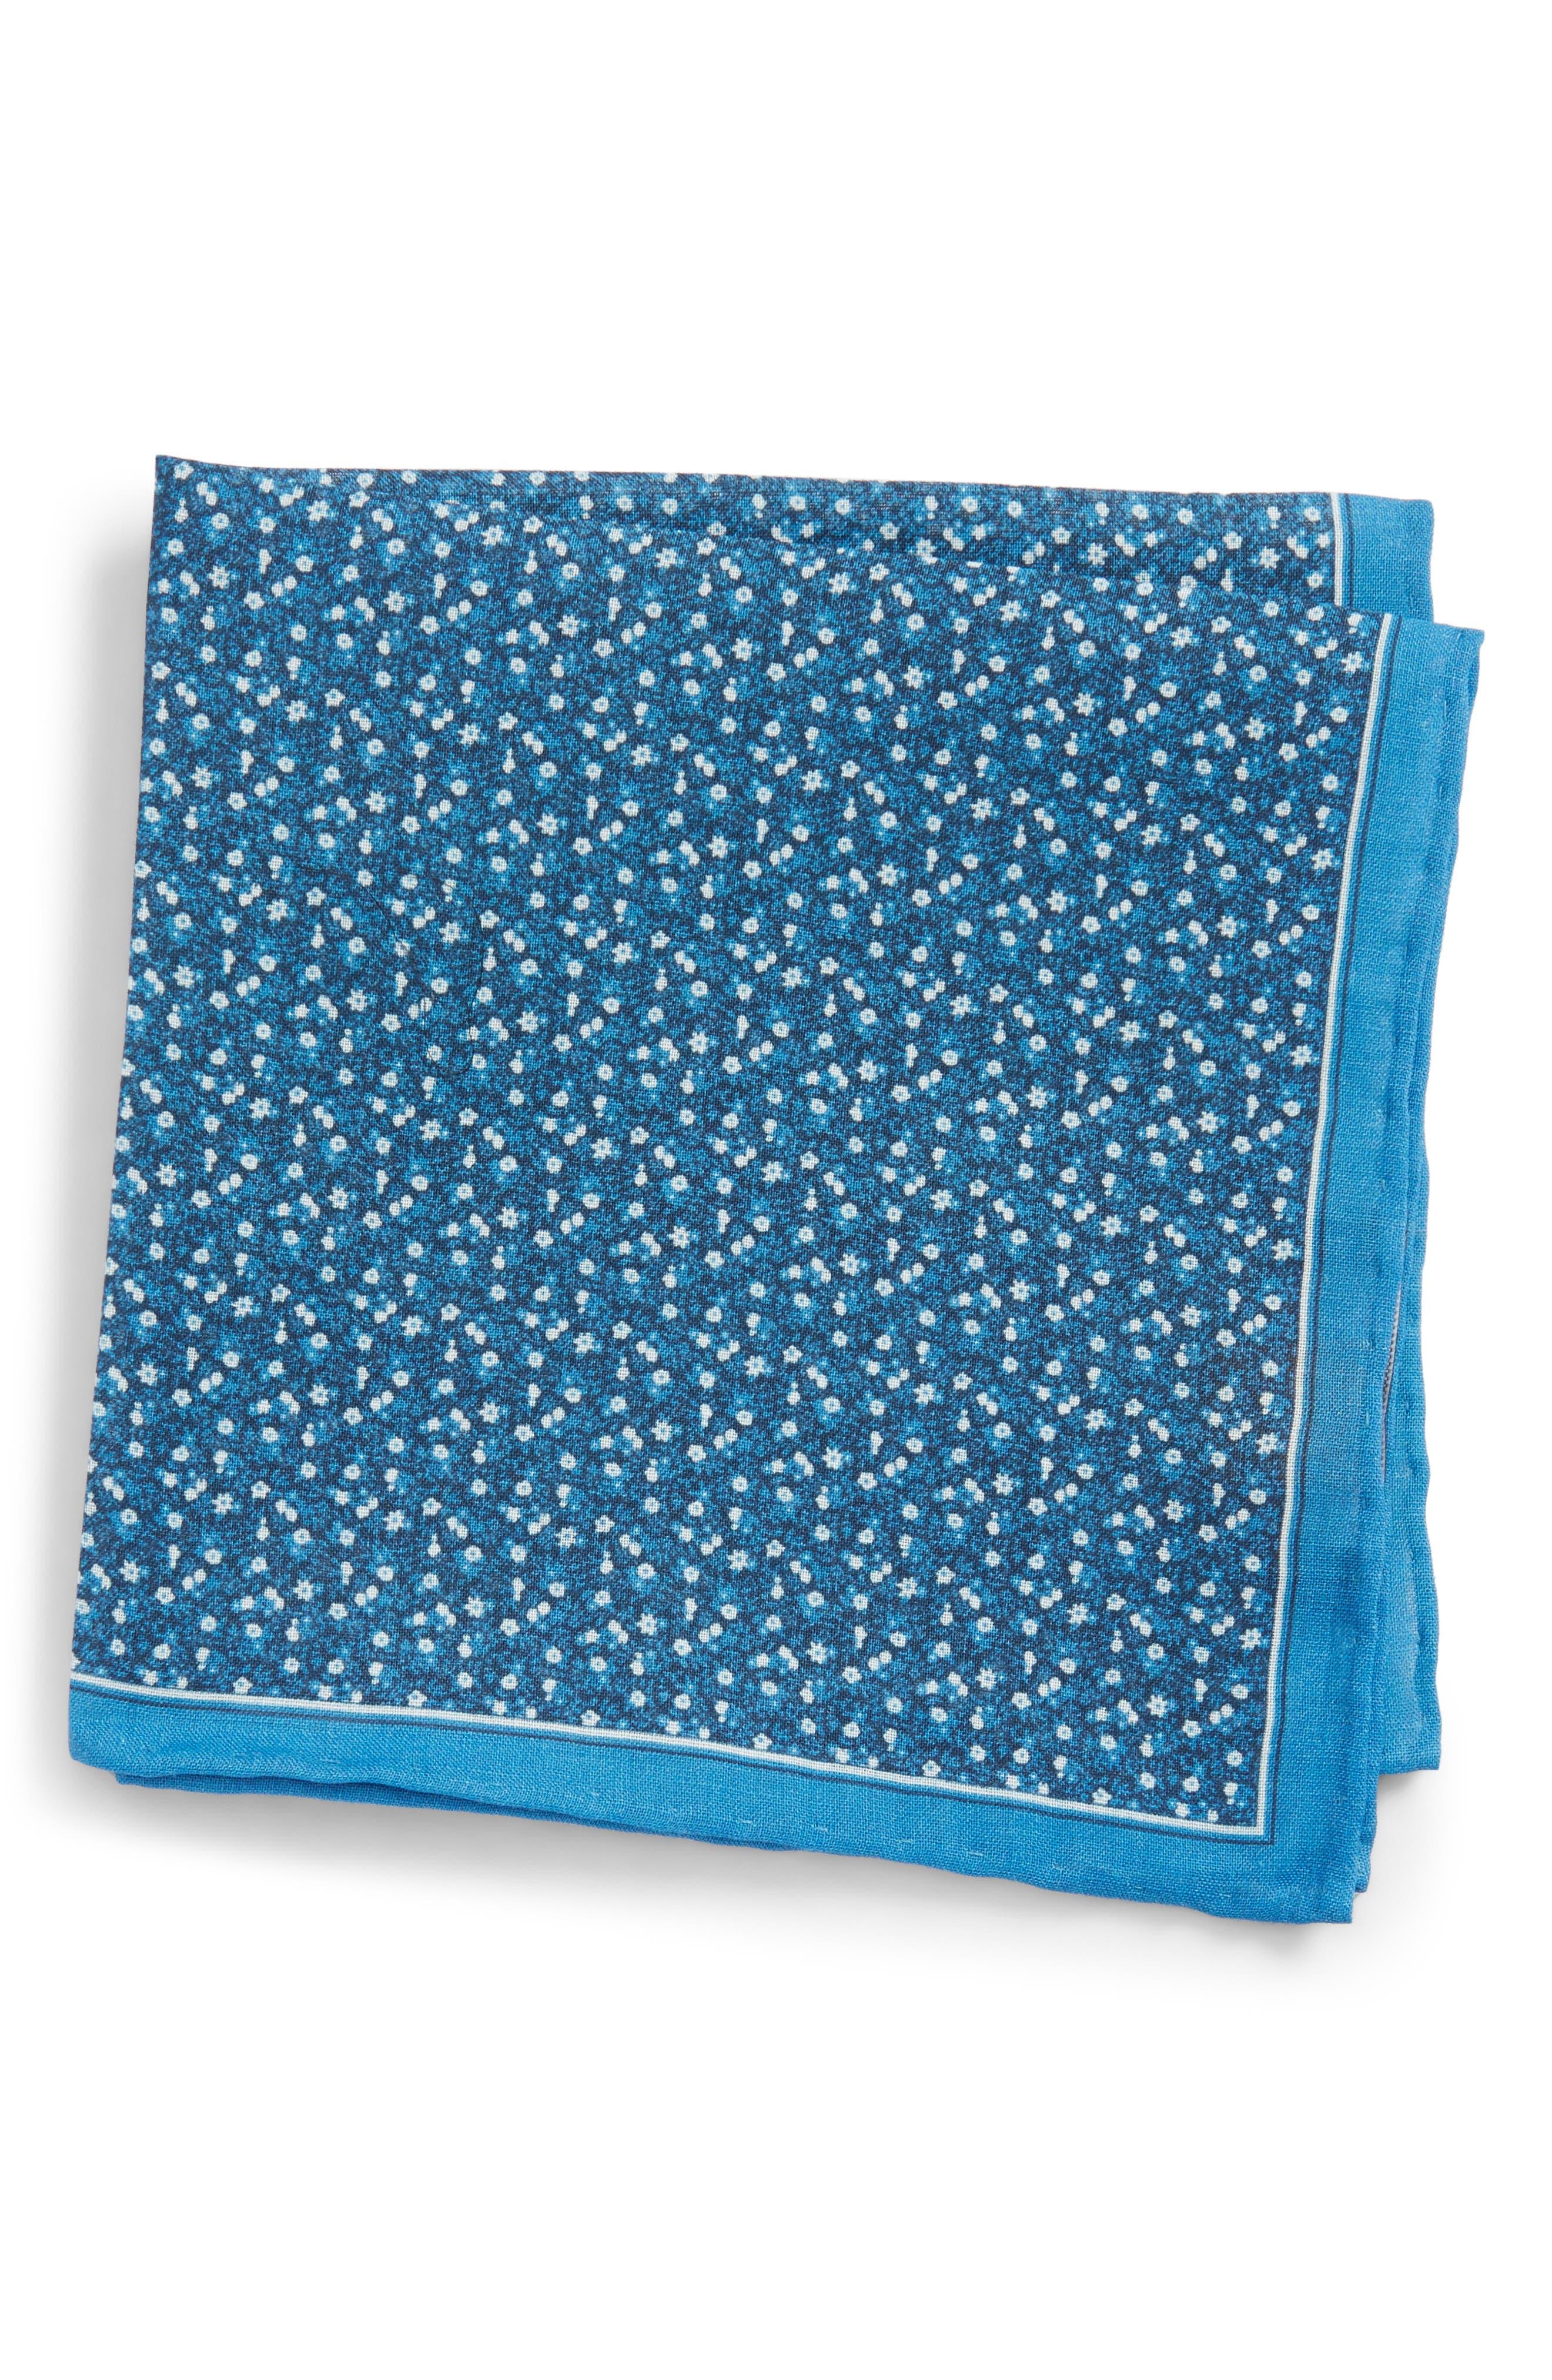 Floral Mark Linen Pocket Square,                             Main thumbnail 1, color,                             Blue